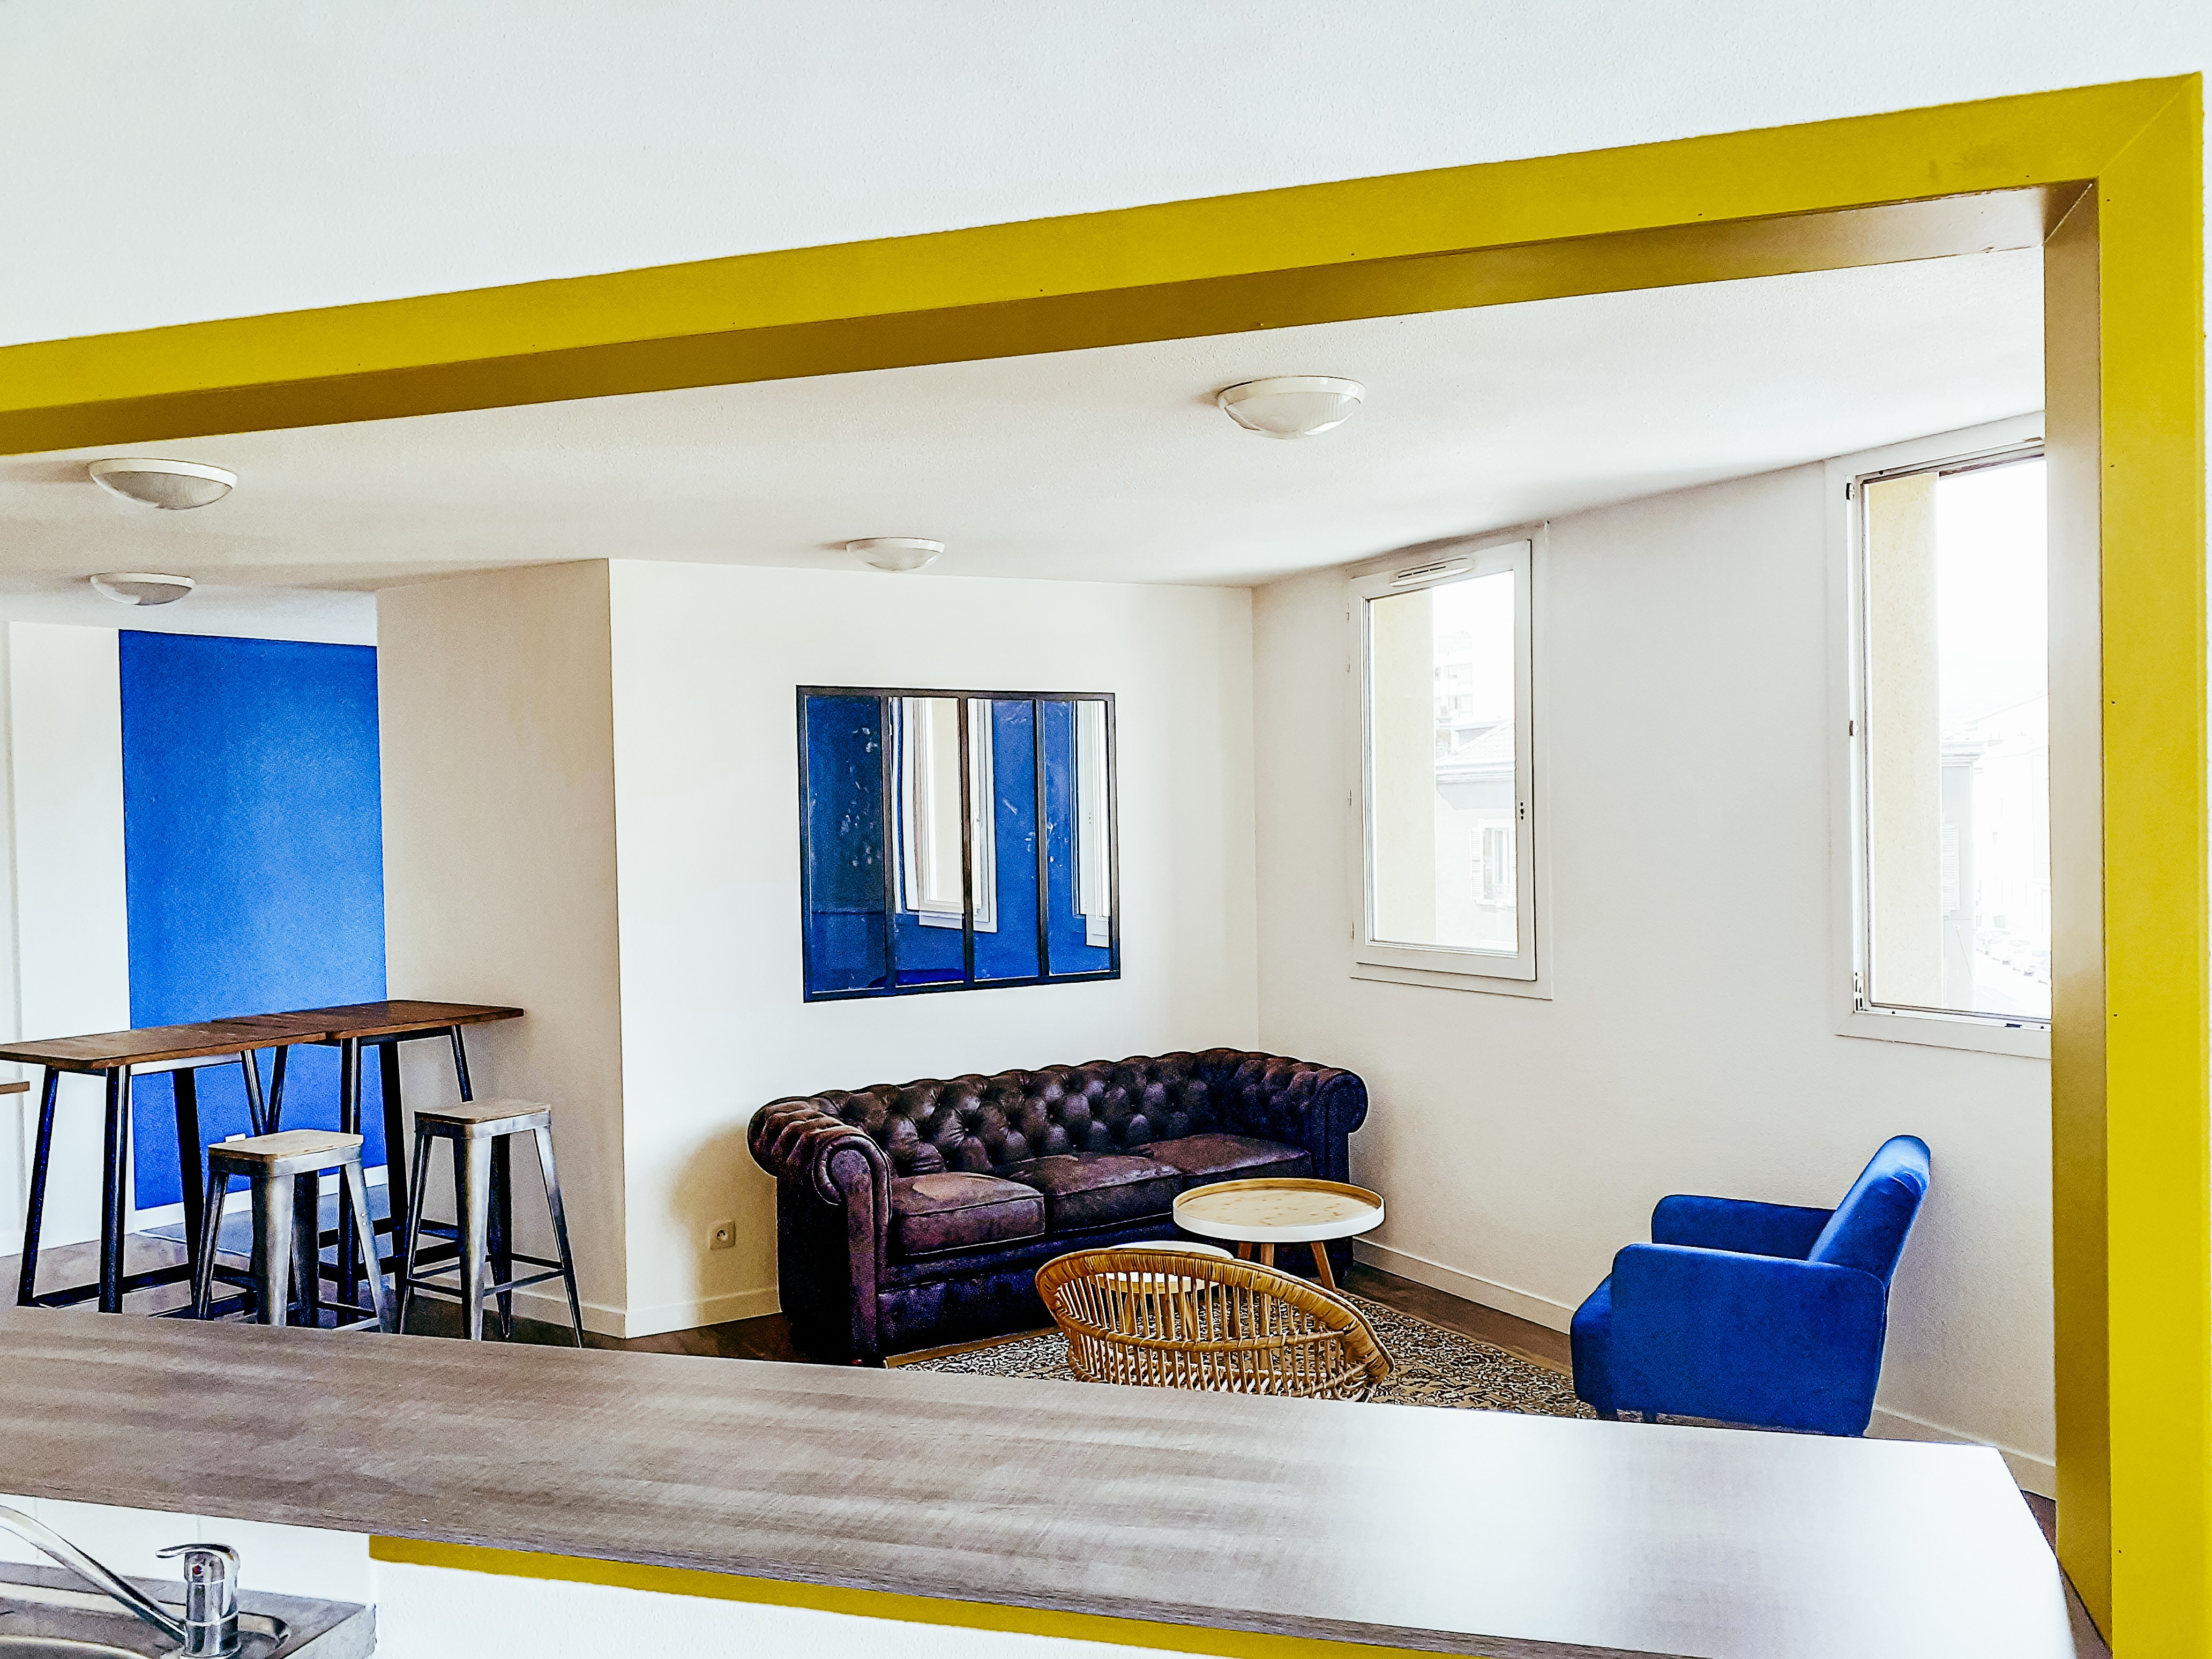 image  2020 10 22 residence etudiante suitetudes salle commune 3 2